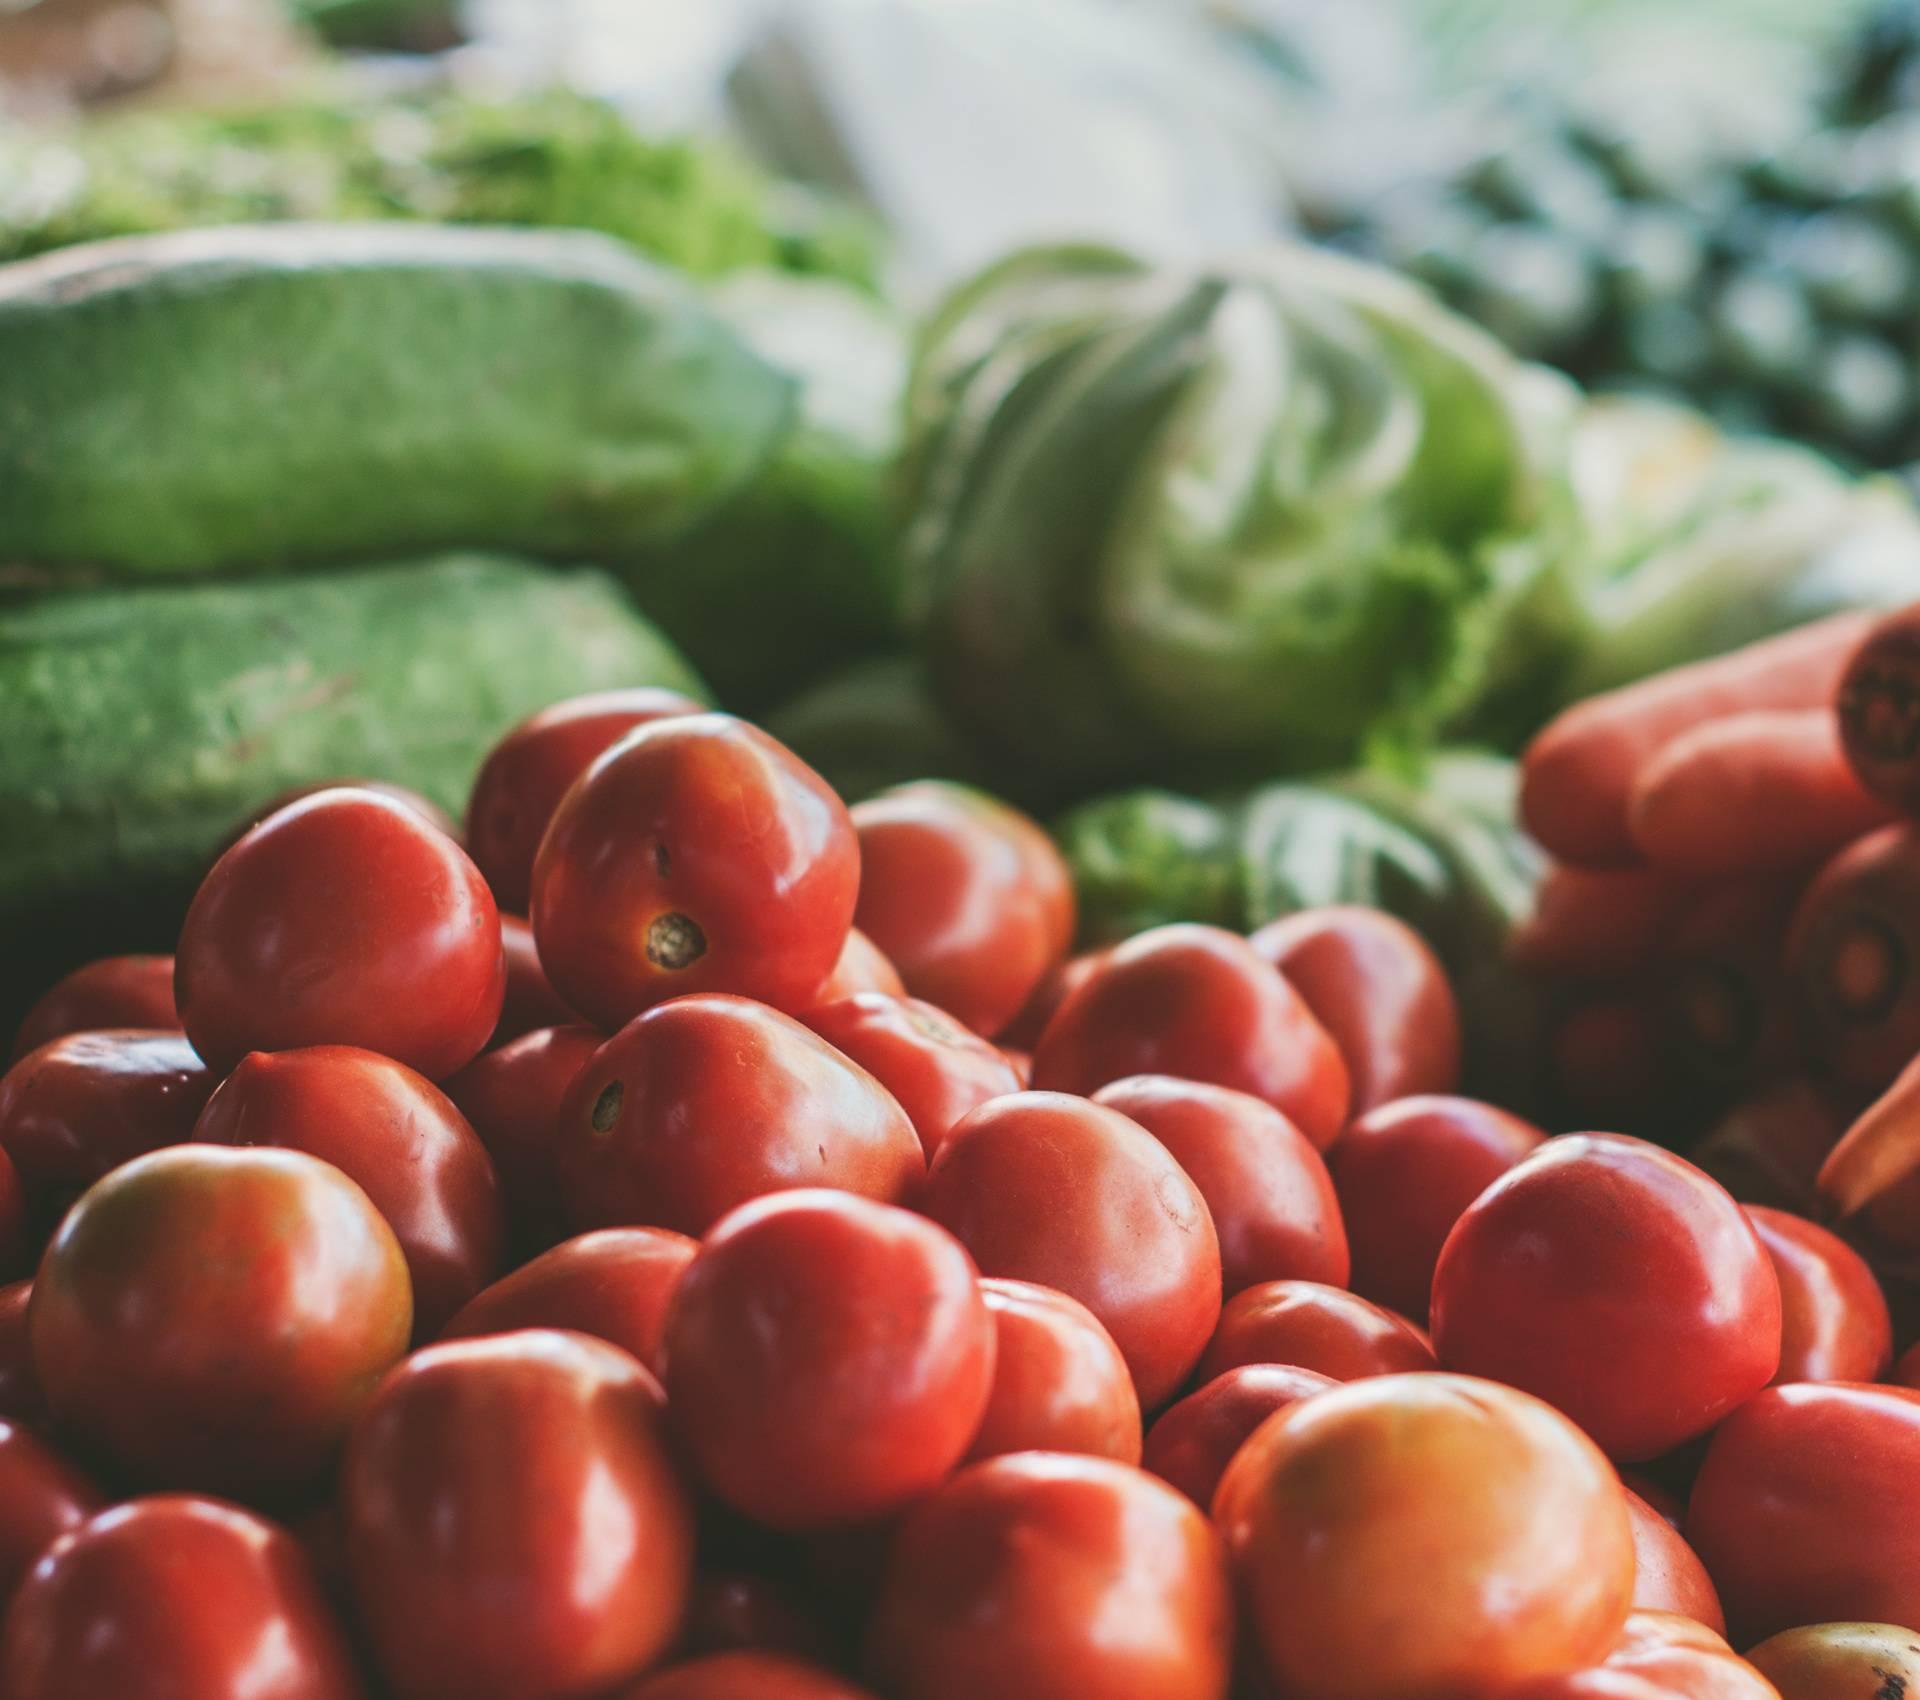 Urbano vrtlarenje: poljoprivreda se seli na krovove